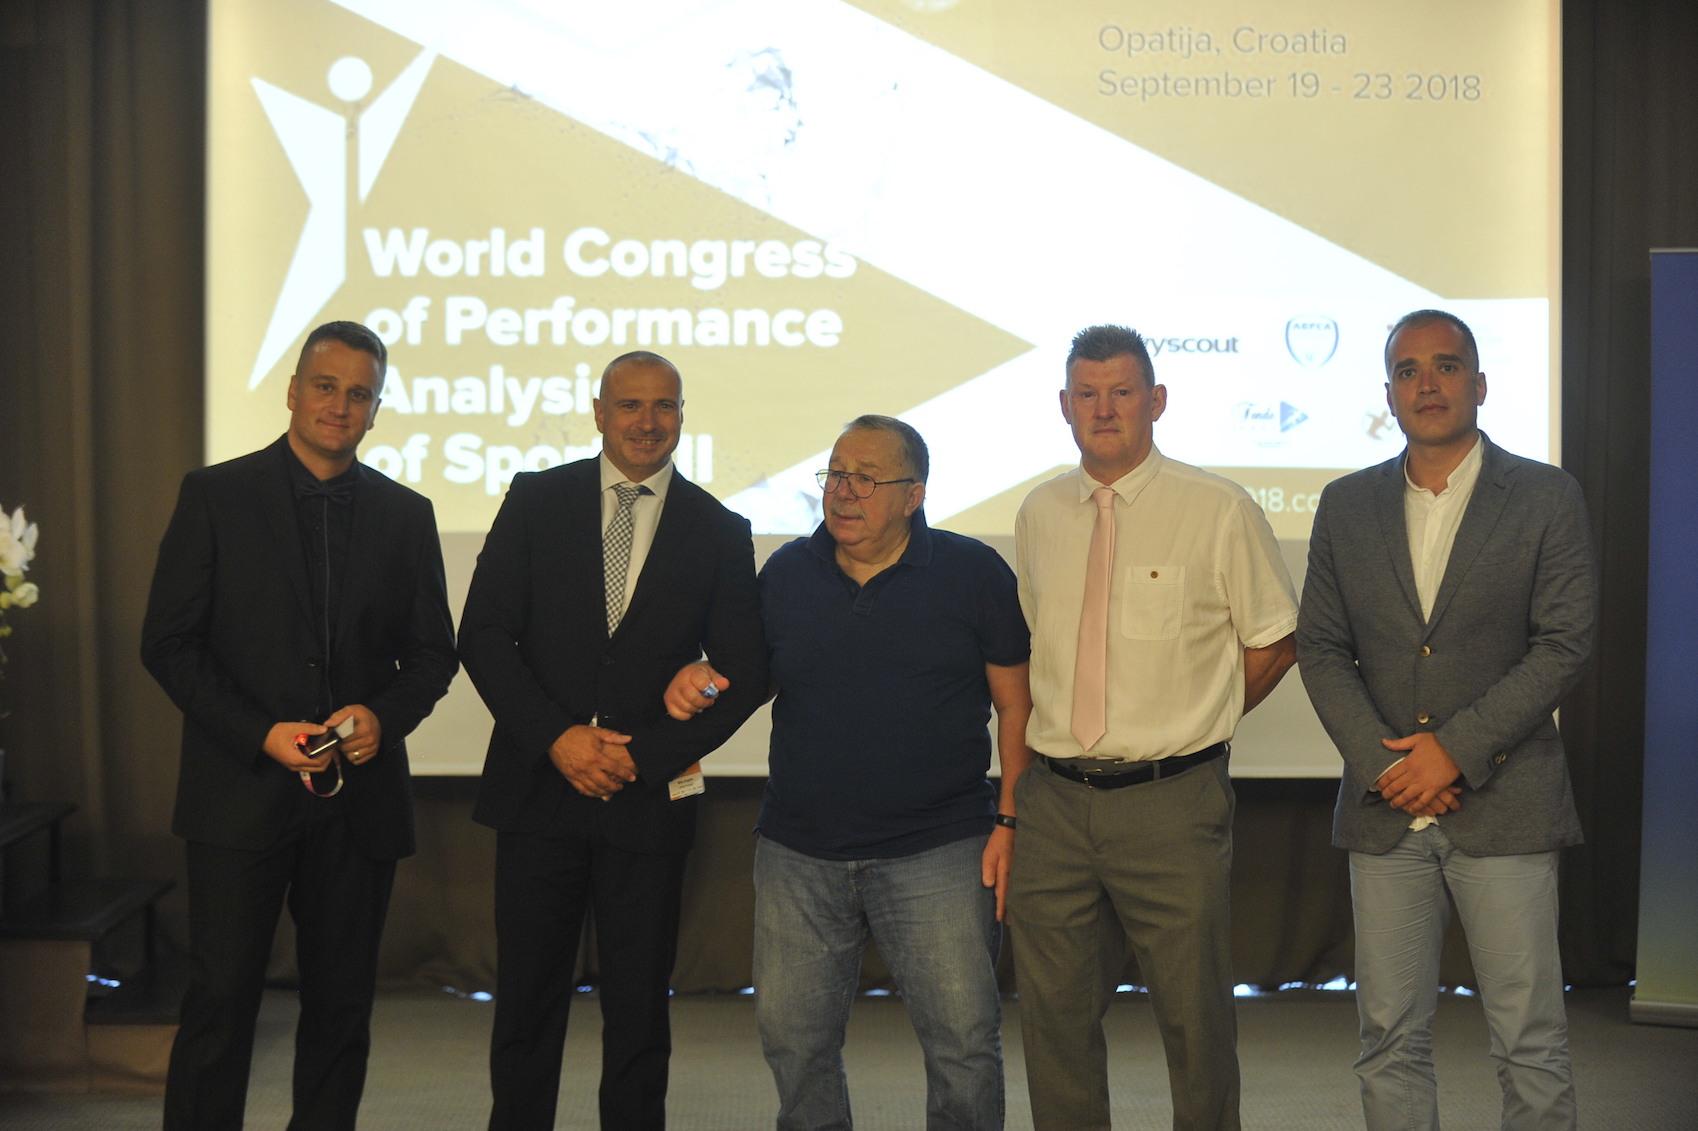 Goran Sporiš, Tomislav Krističević, Mike Hughes, Nic James i Stevo Popović